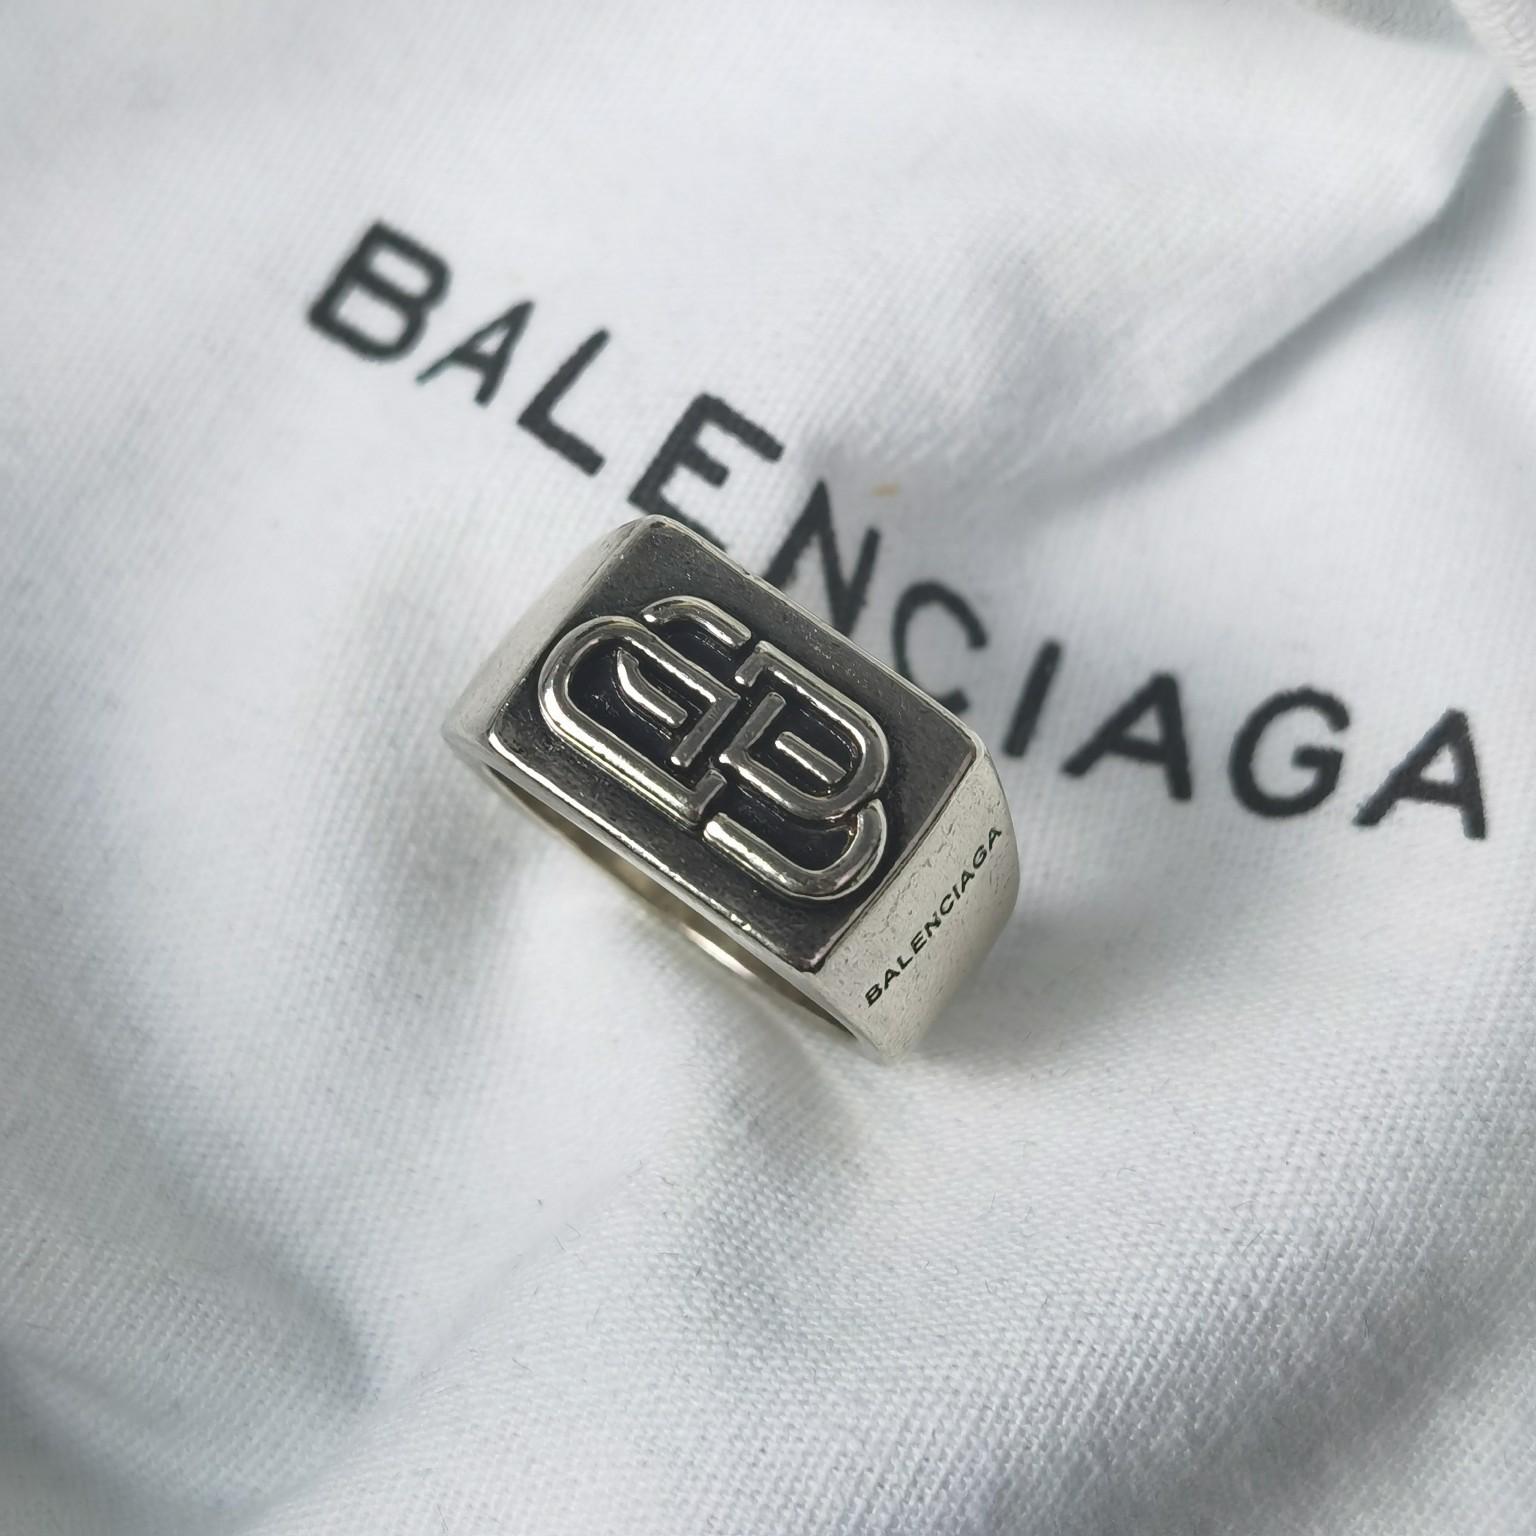 BB巴黎世家中古方形戒指逾九十年以来